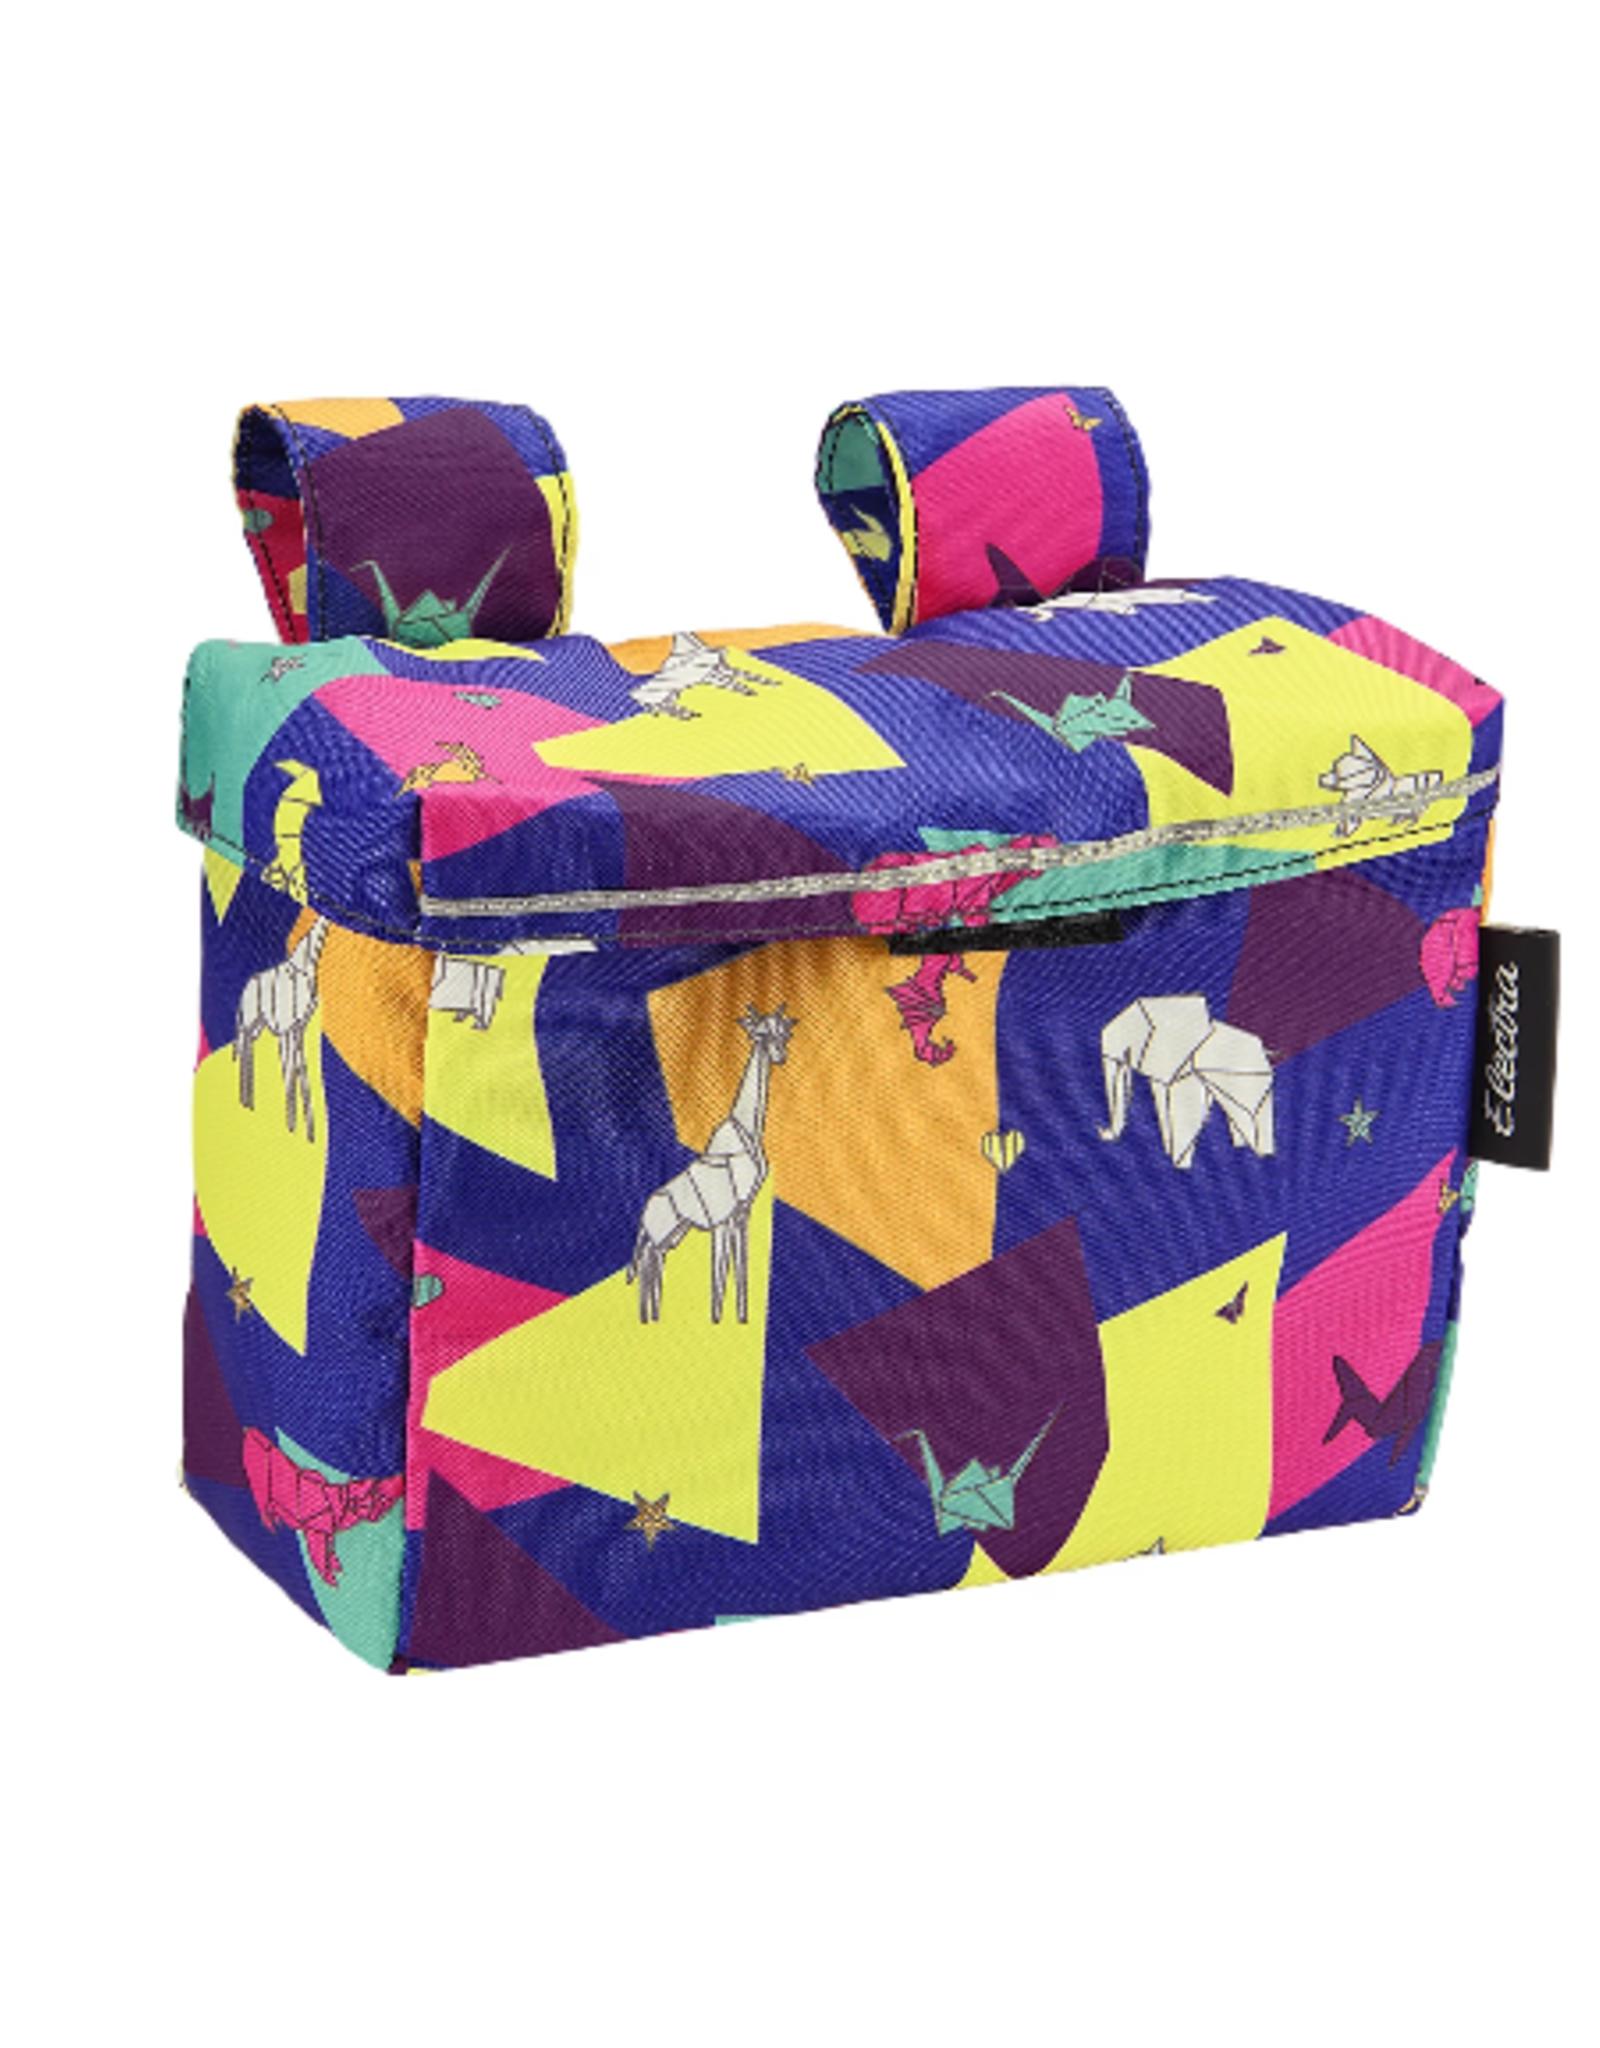 Electra Electra Handlebar Velcro Wlid Washi Bag